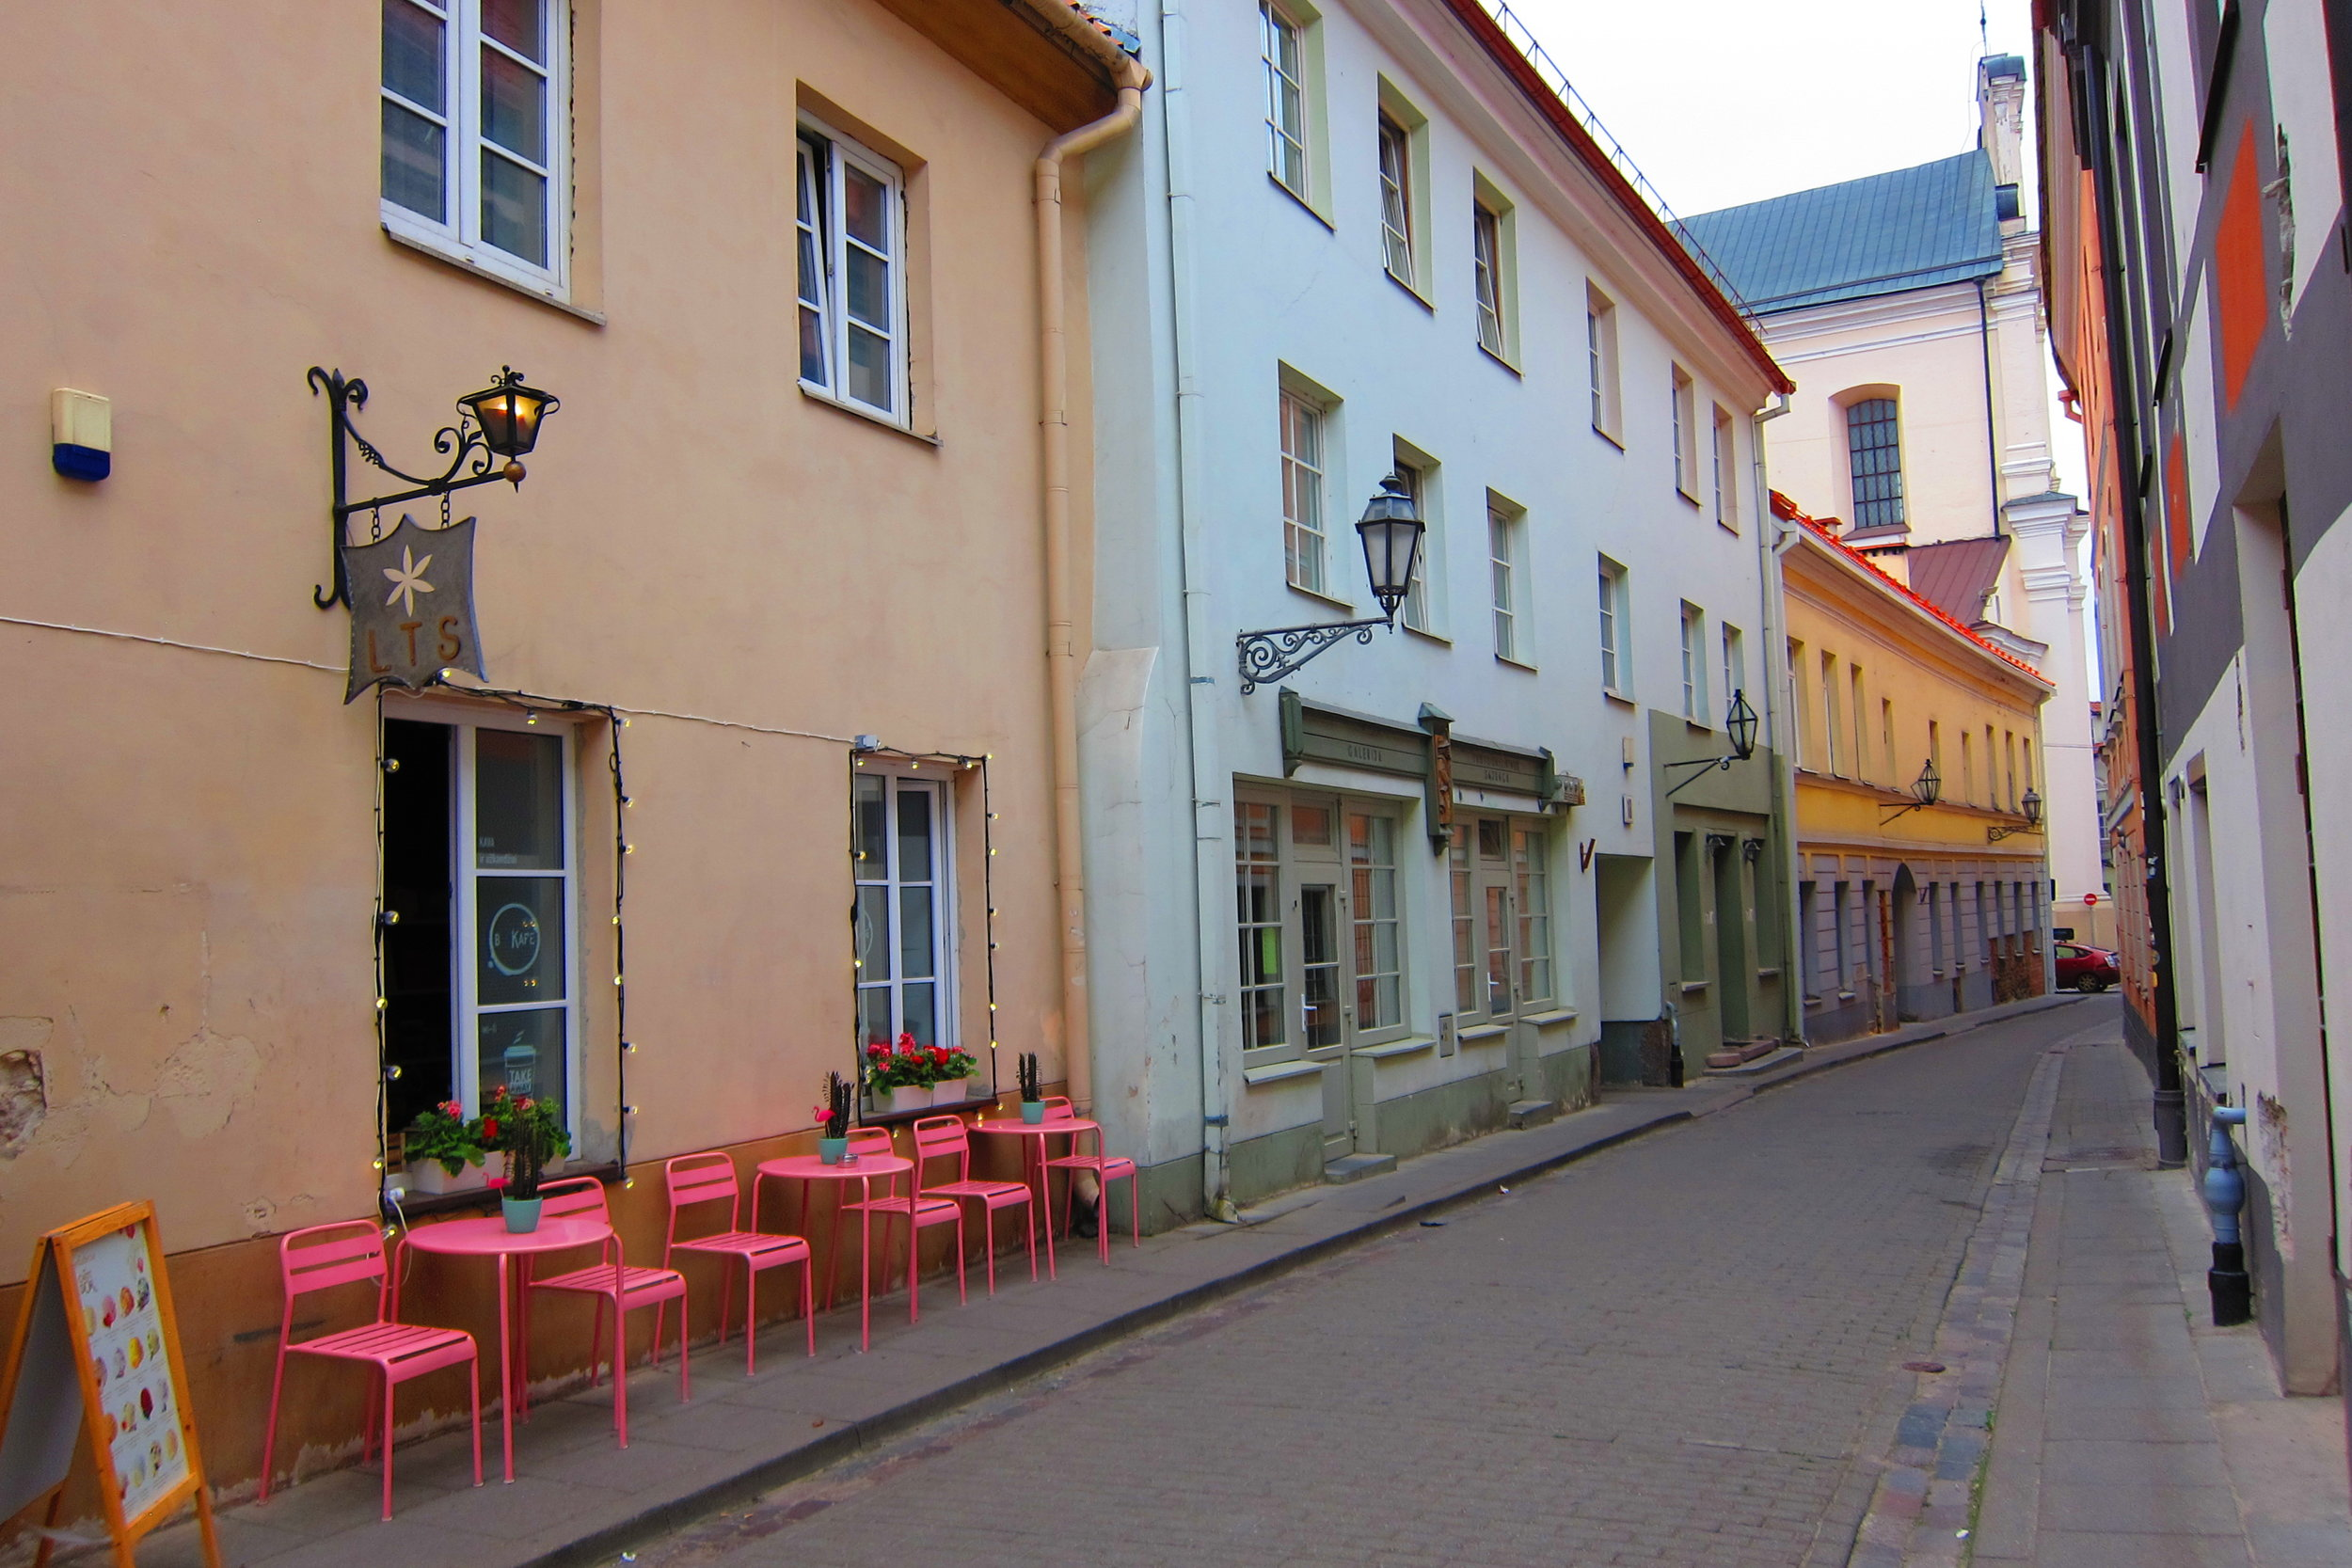 Vilnius, Lithuania, 5/24/19